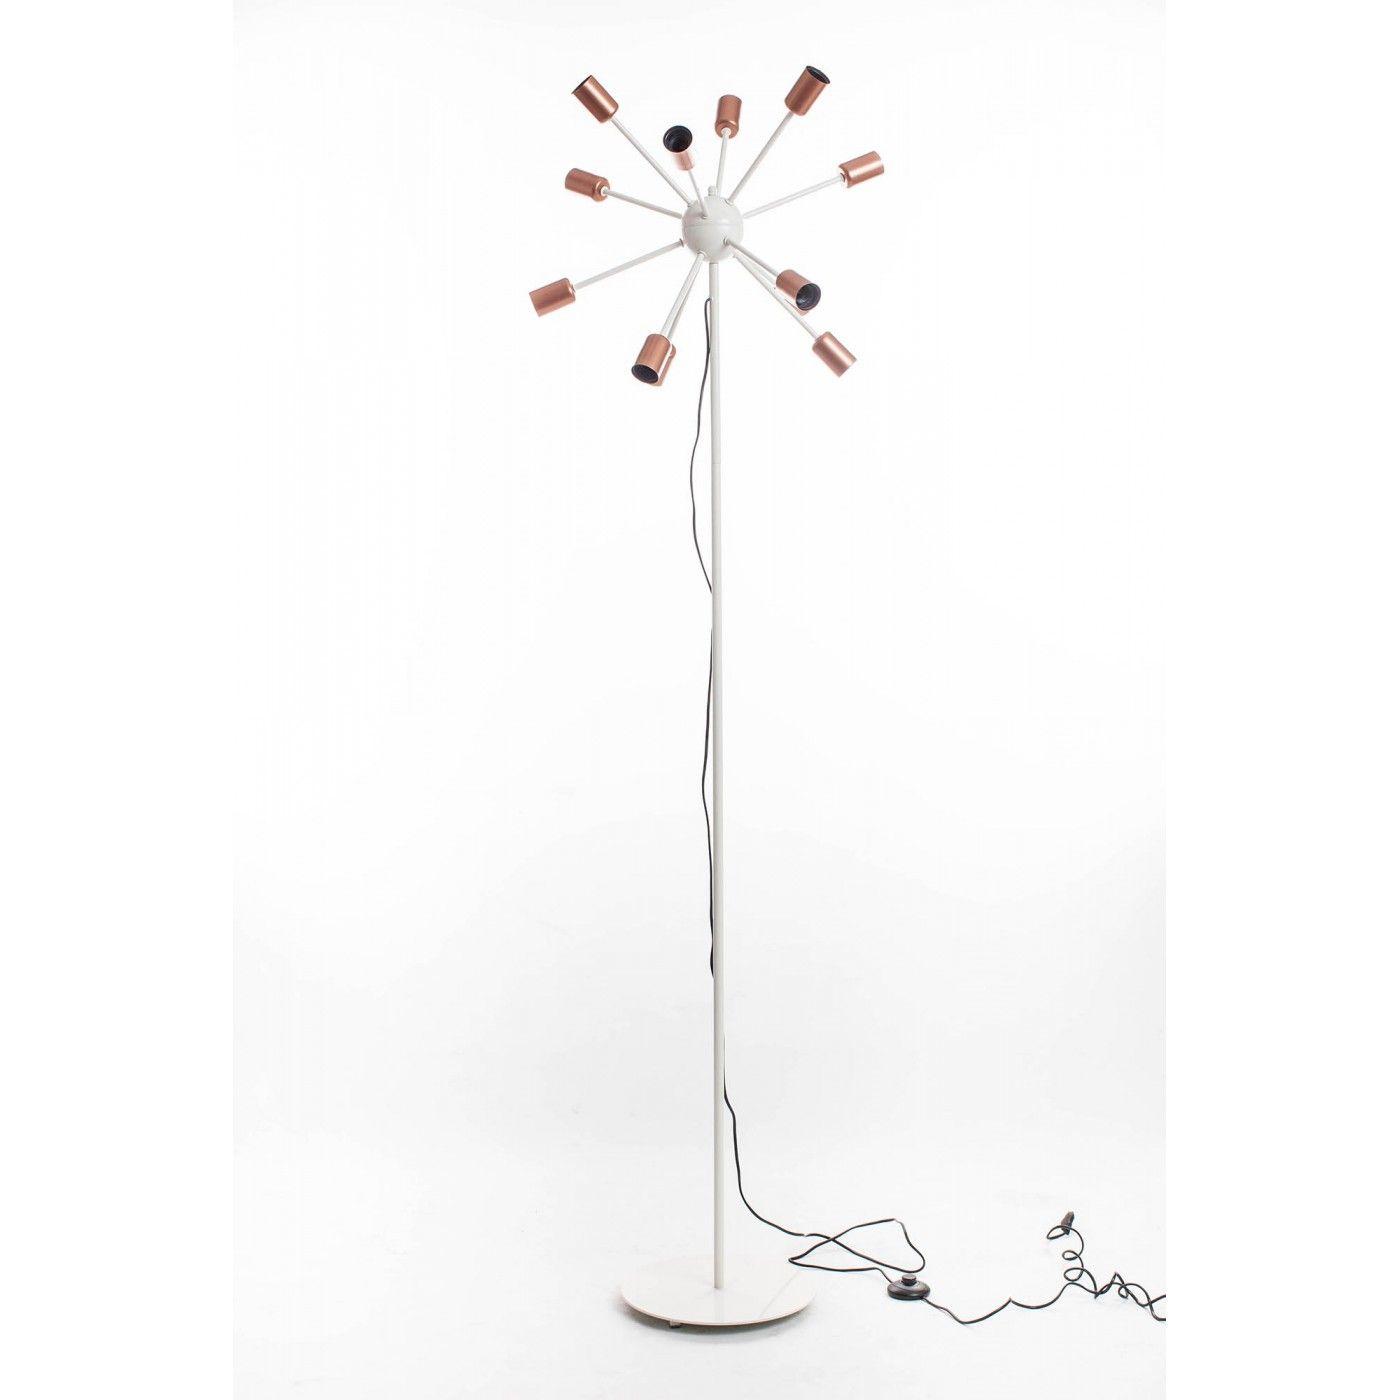 Loft Lampa Podlogowa Genewa Bezowa 190x59x59 Cm Tb330 House Design Design Decor